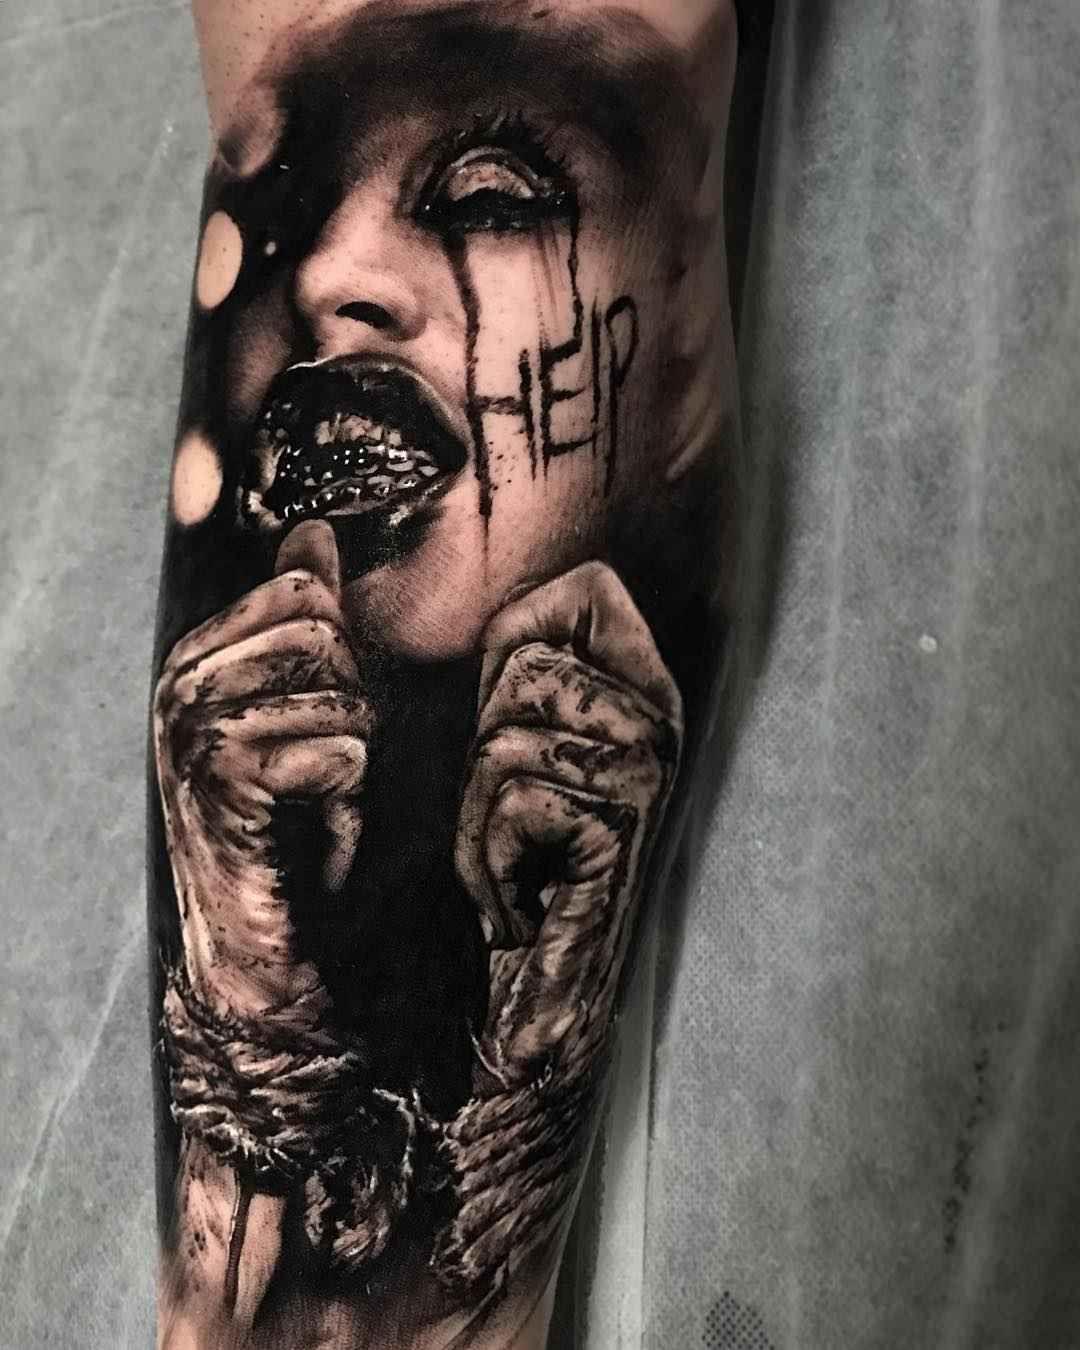 Tattoo Artist Damon Holleis Evil Tattoos Scary Tattoos Tattoos For Guys